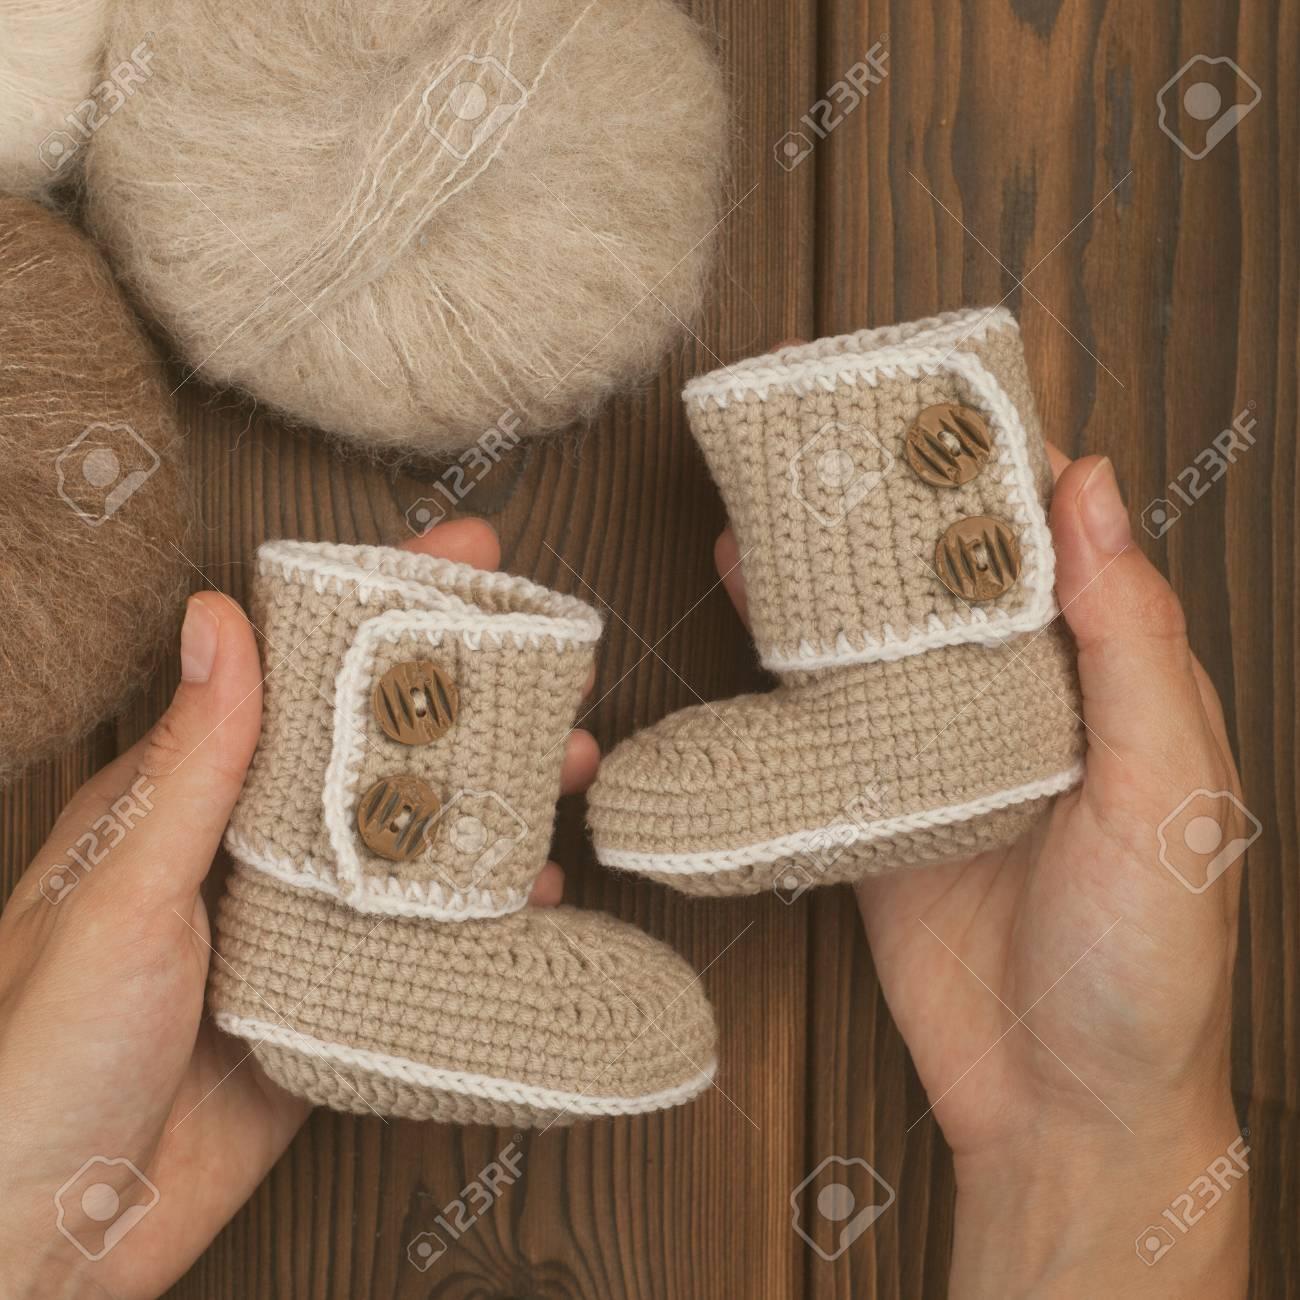 Baby Booties For Newborn Baby In Mother